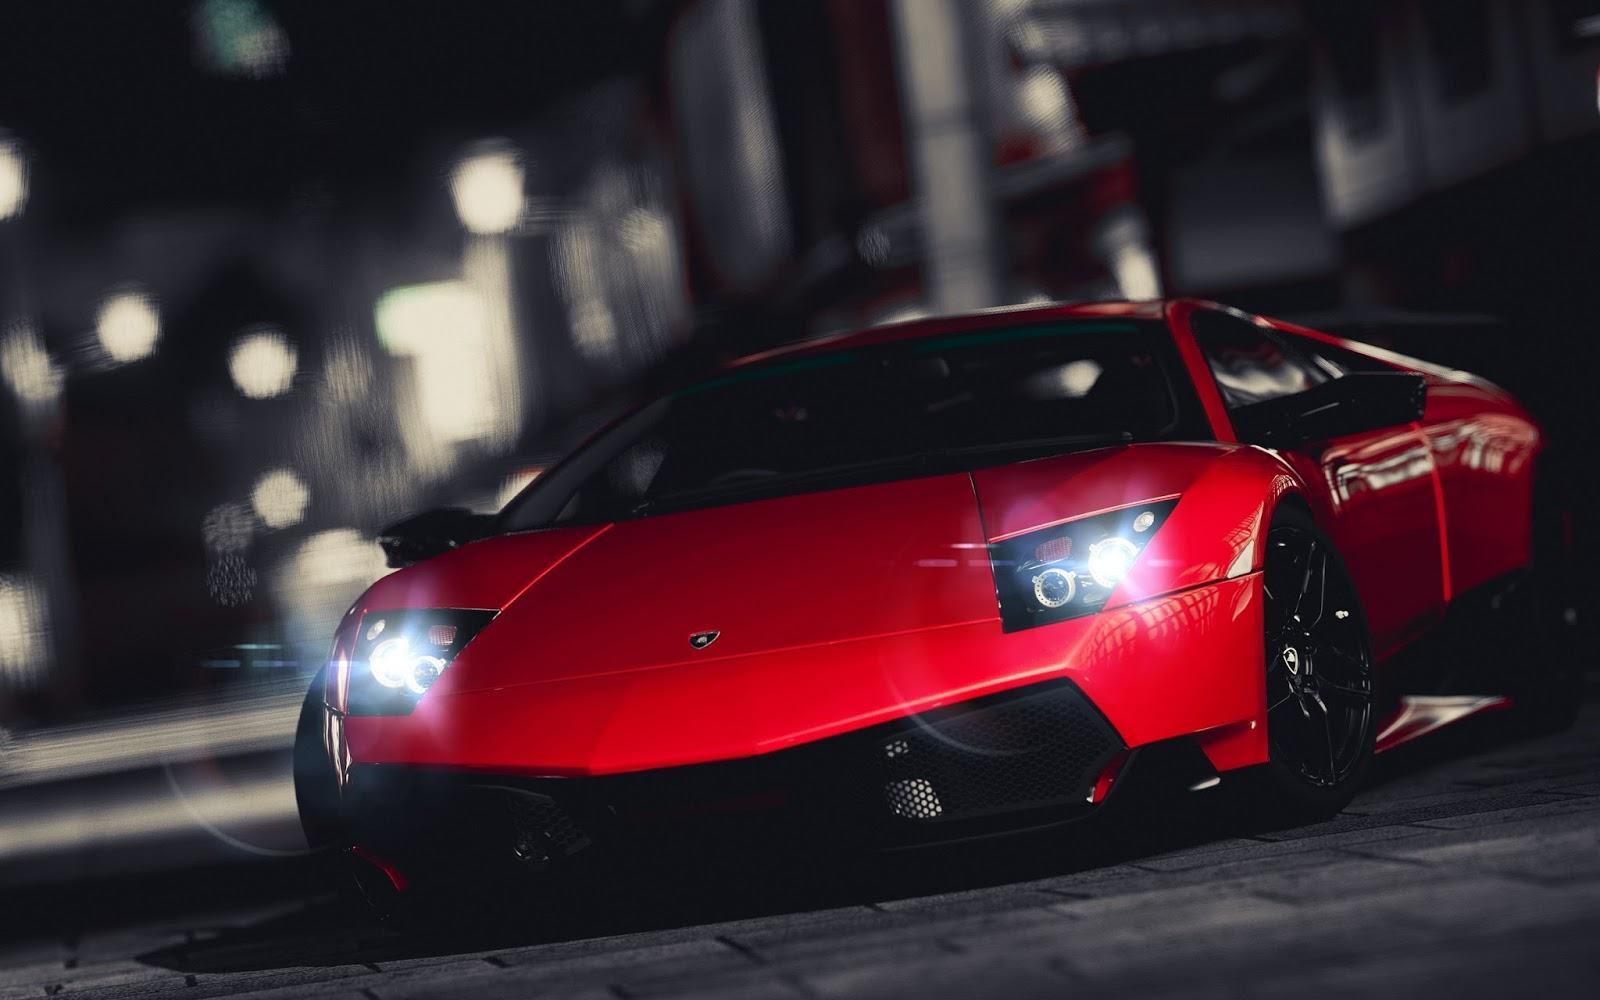 Lamborghini Murcielago Wallpaper HD for Desktop